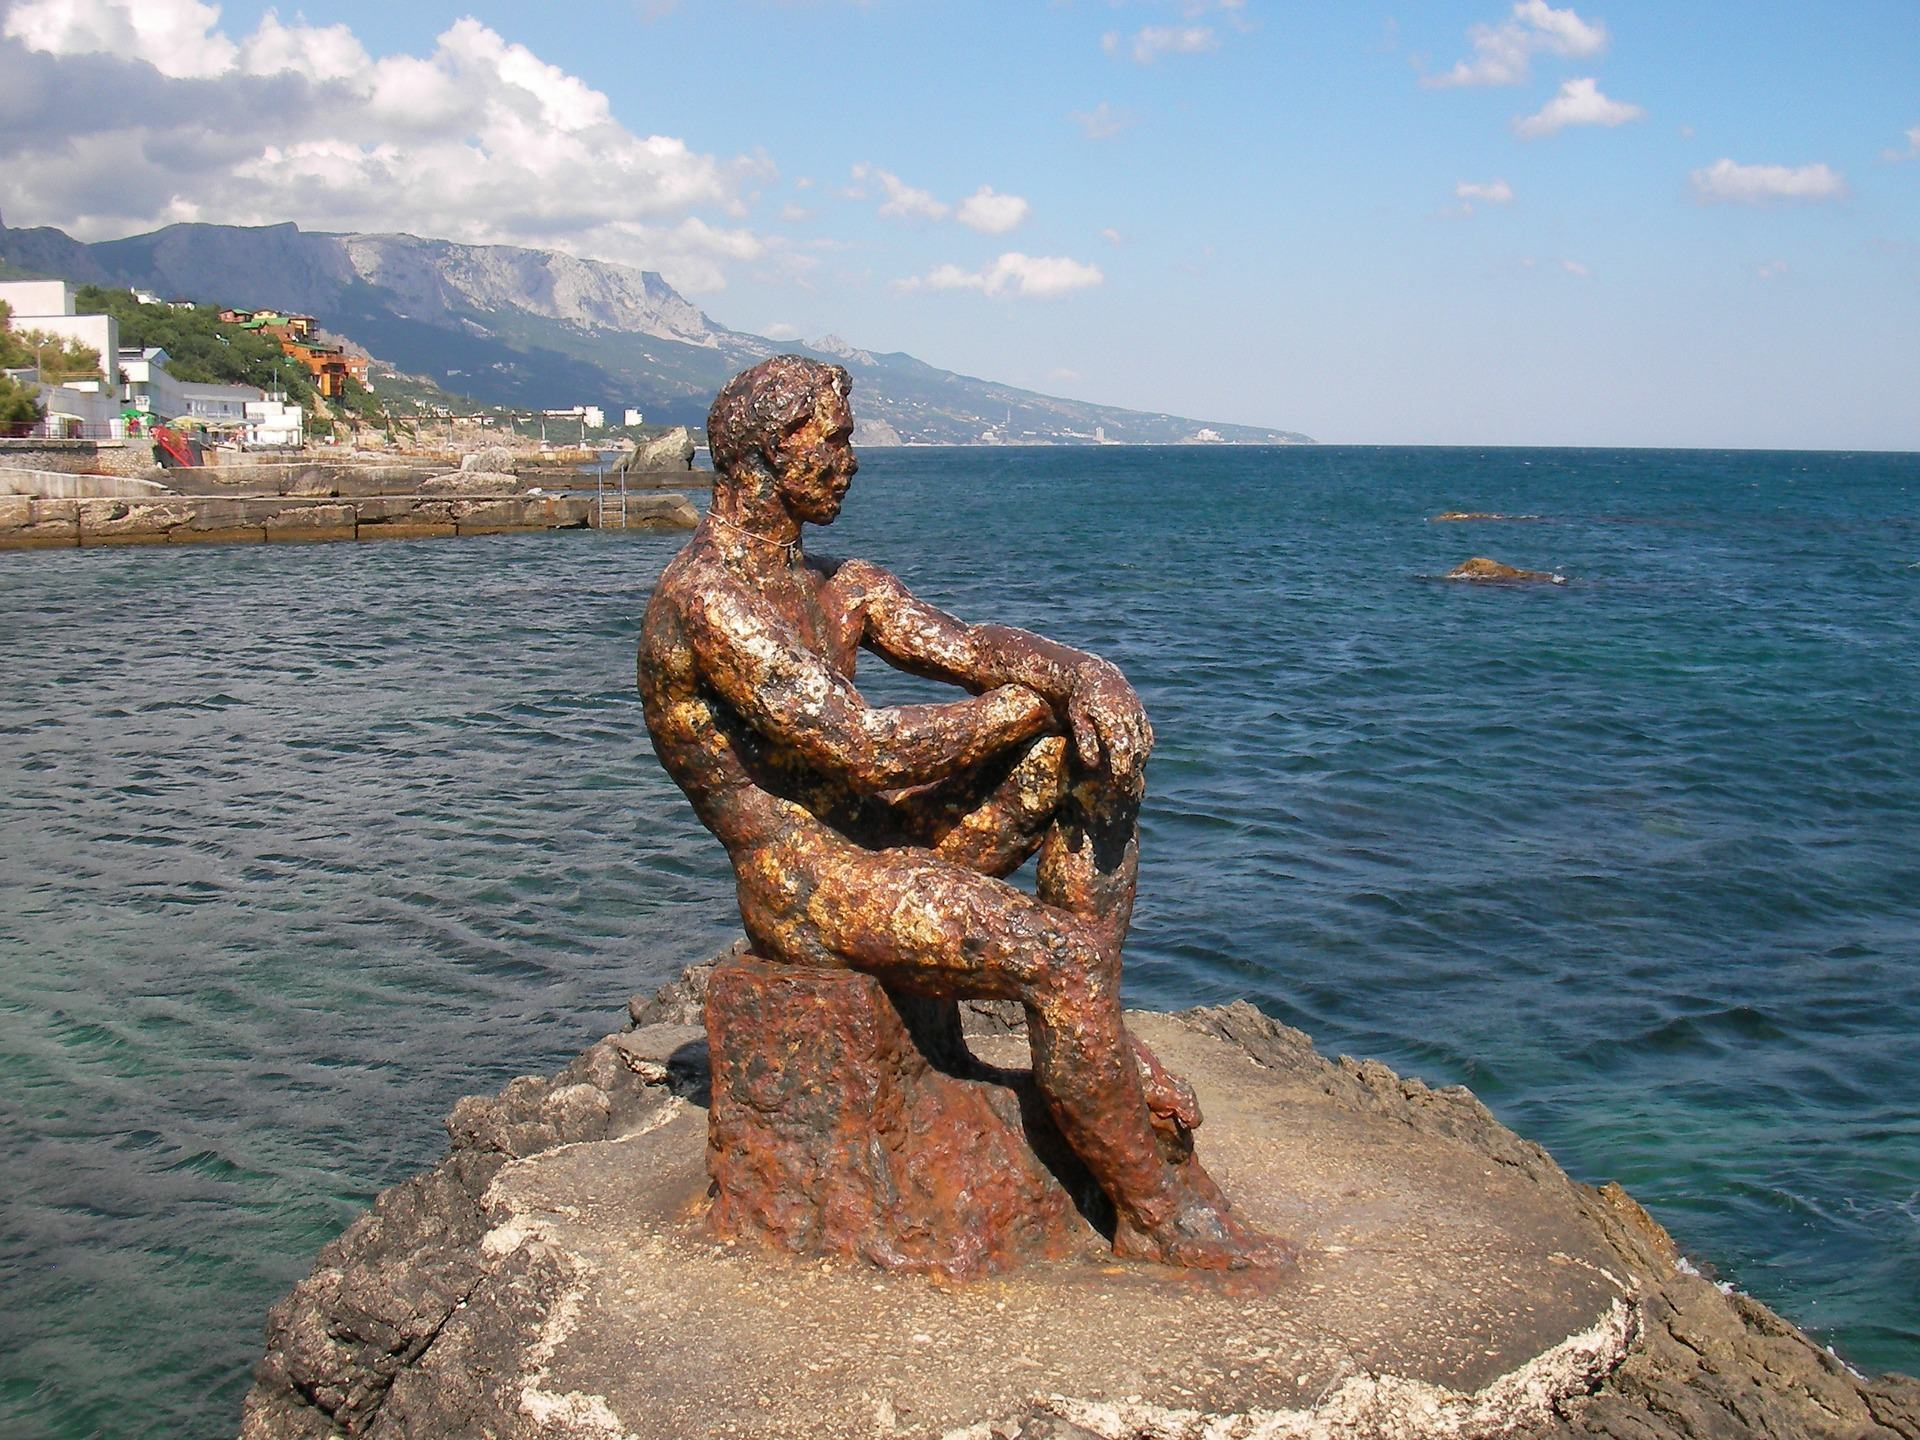 Rusty metal sculpture of man in Foros